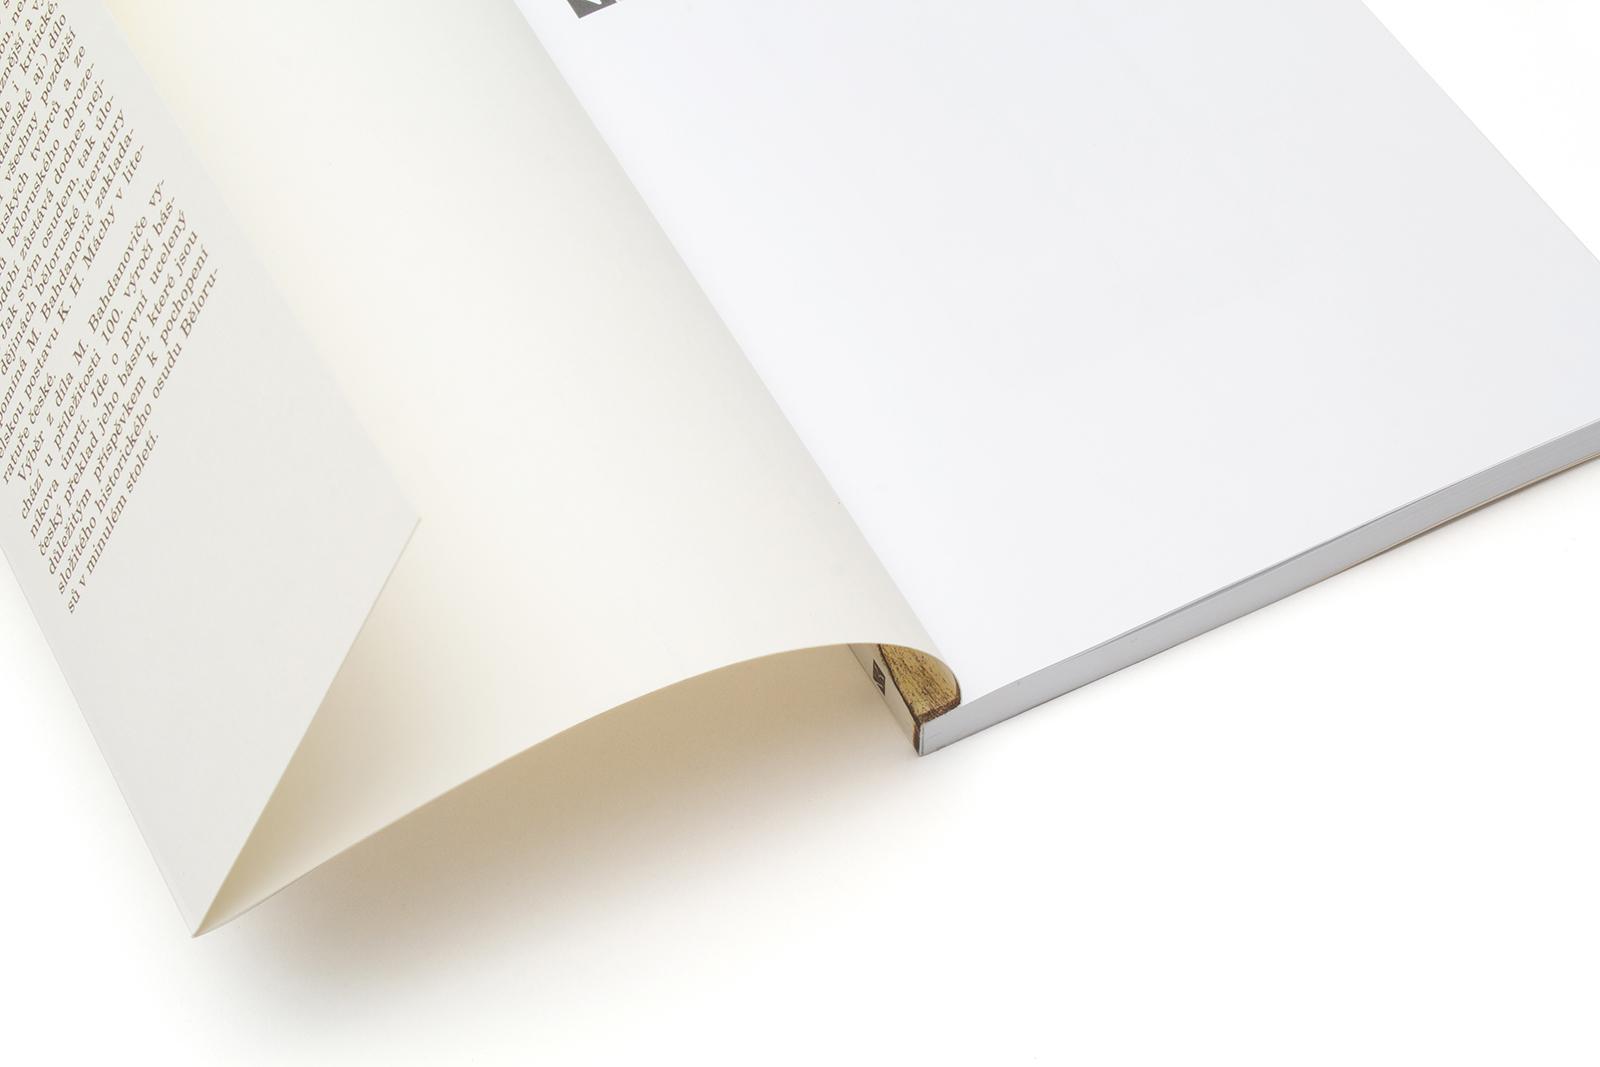 Desky s klopami